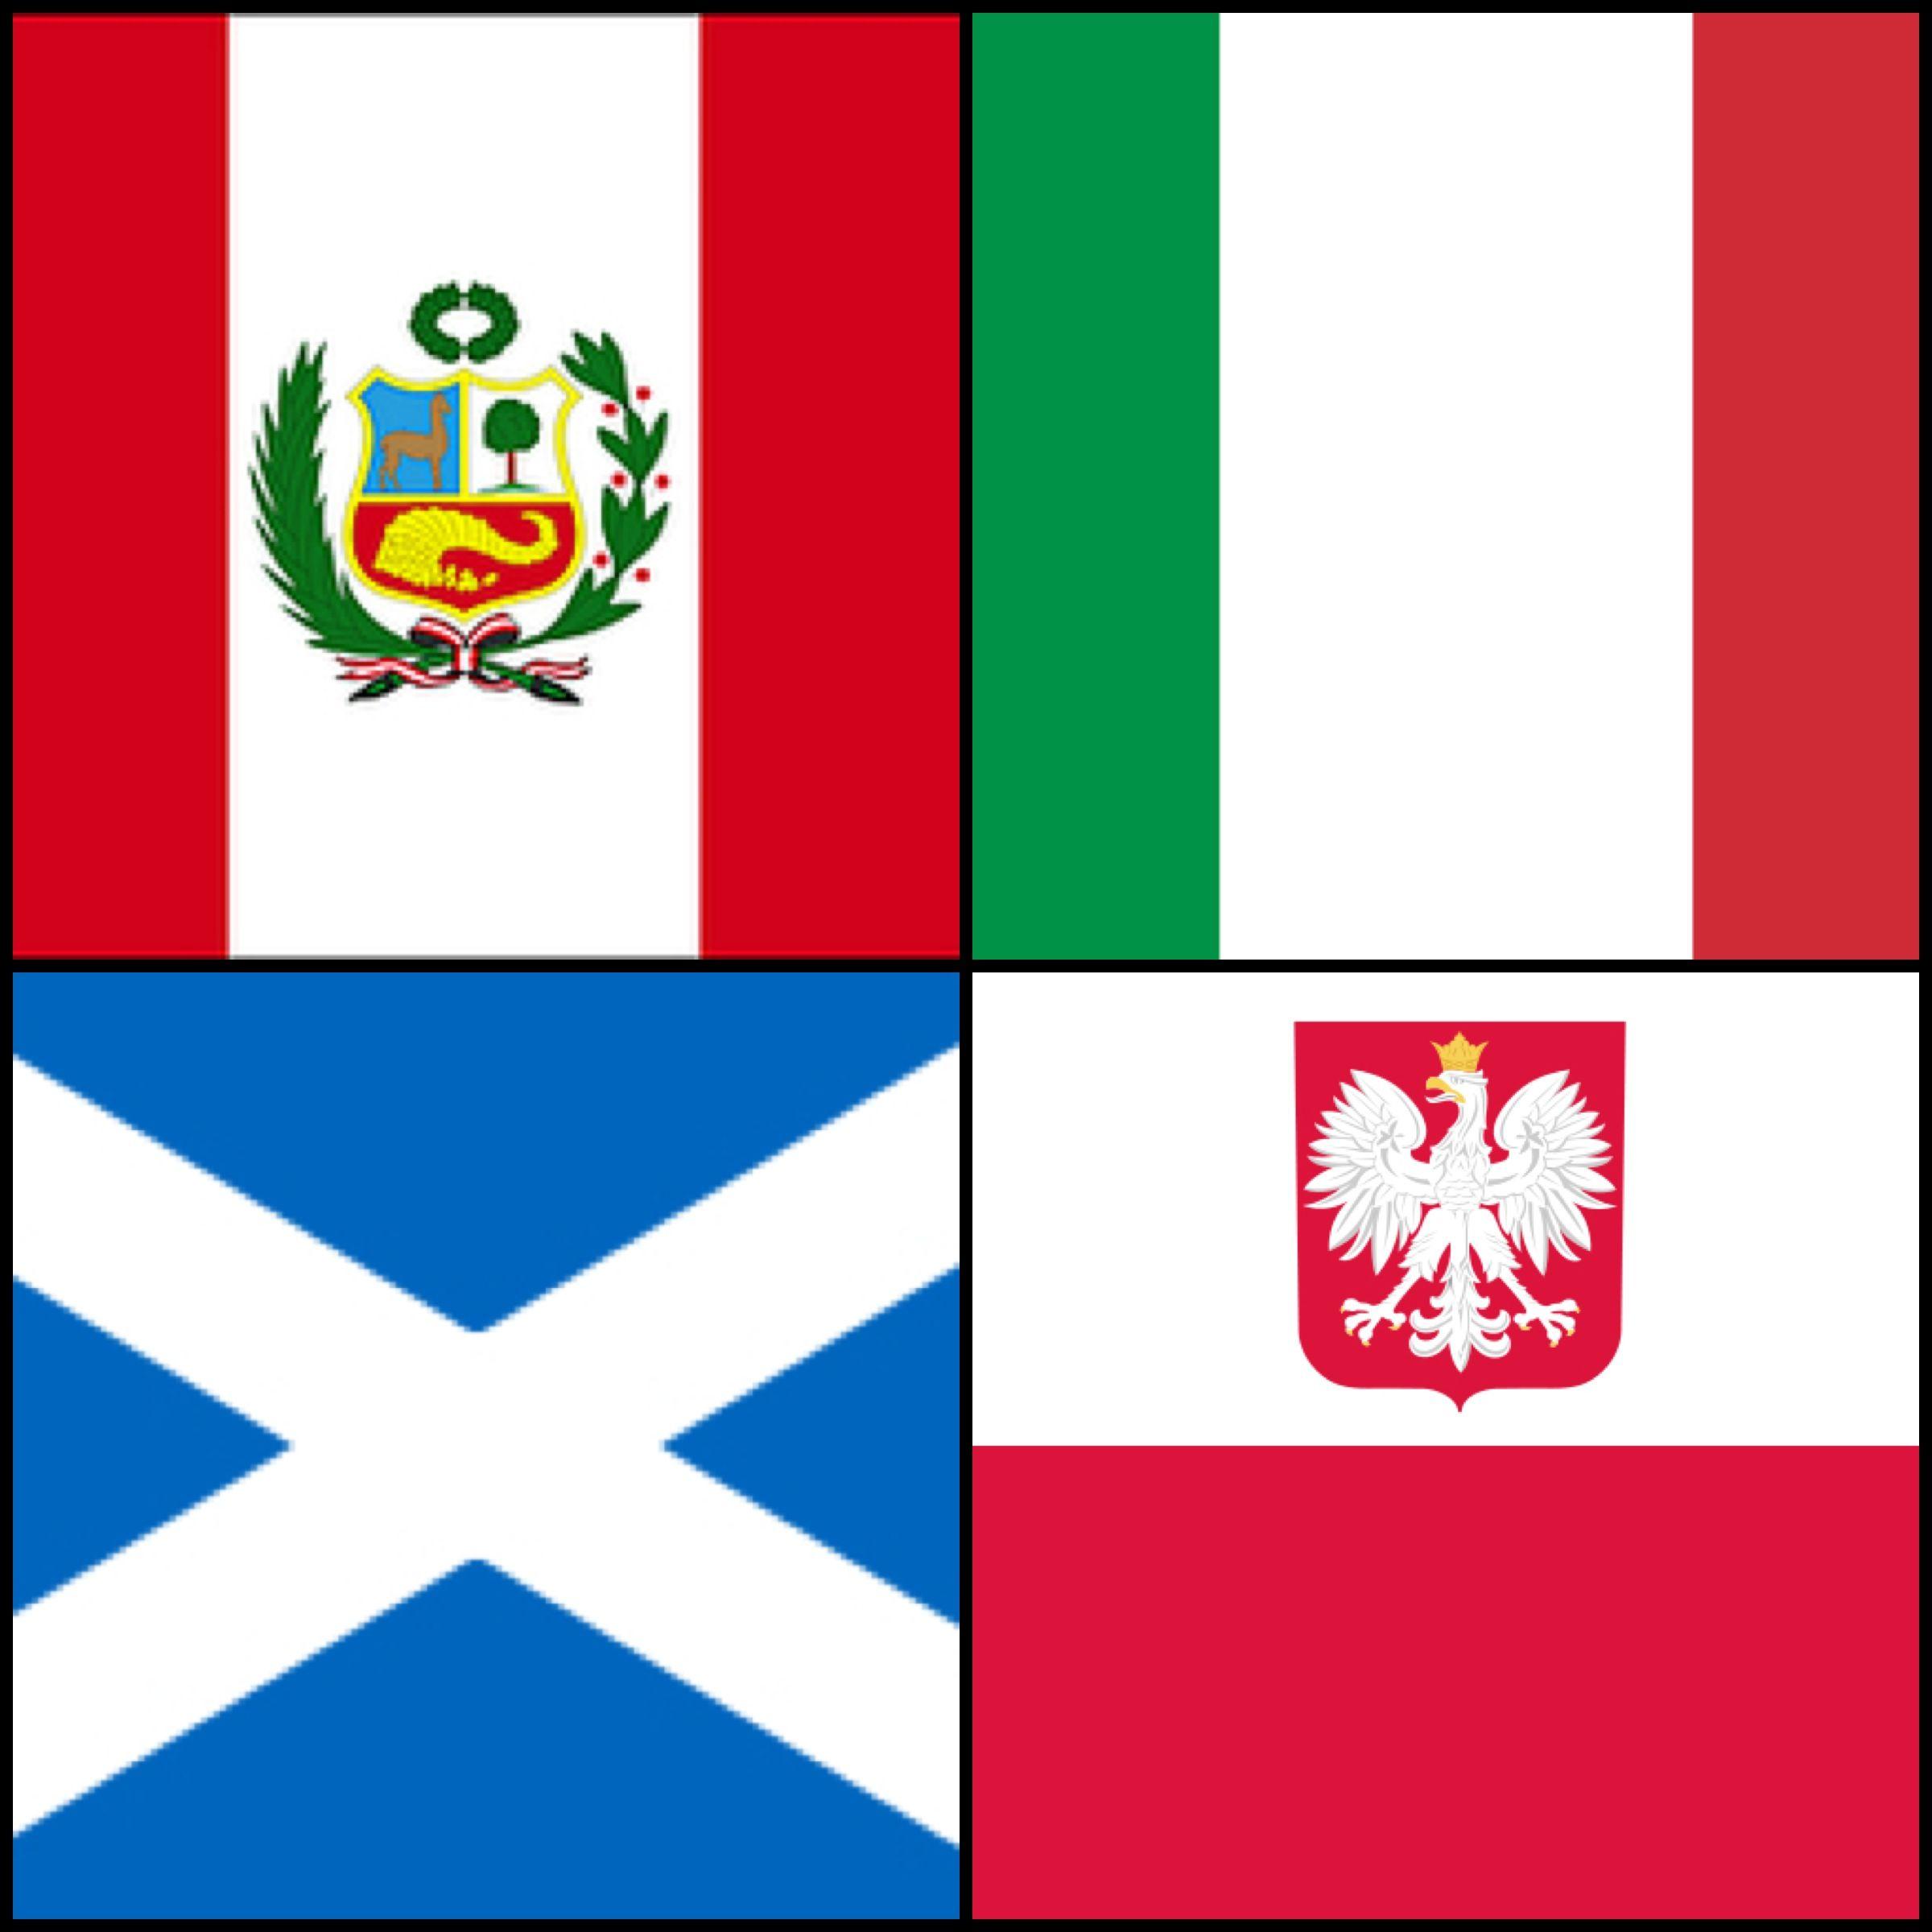 peruvian flag italian flag scottish flag u0026 polish flag to be